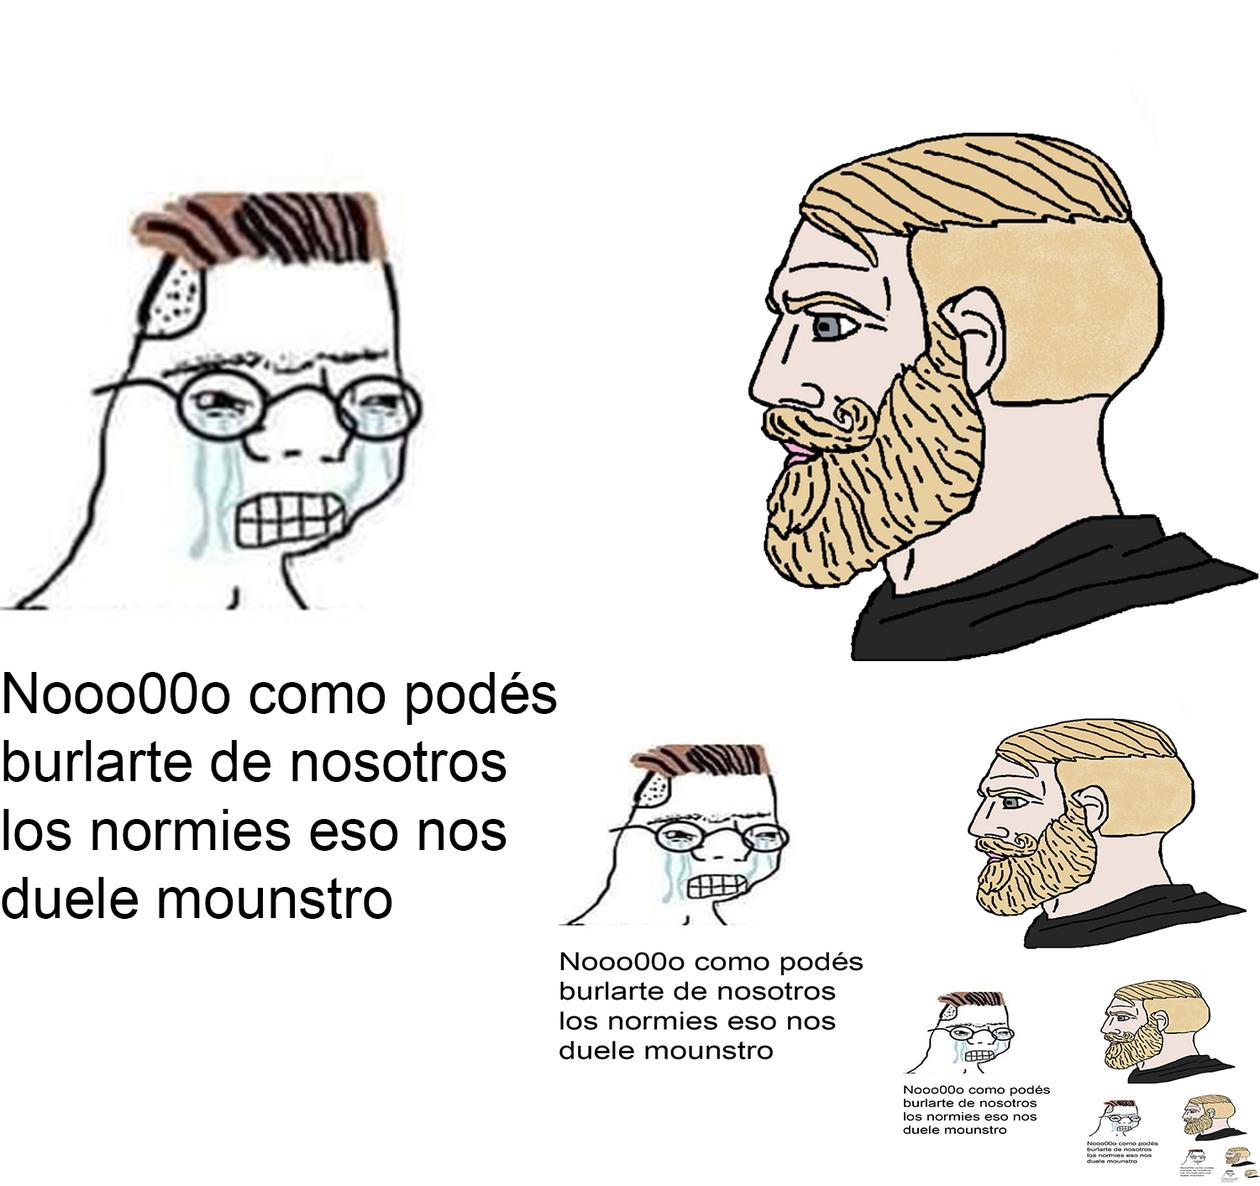 10500 - meme